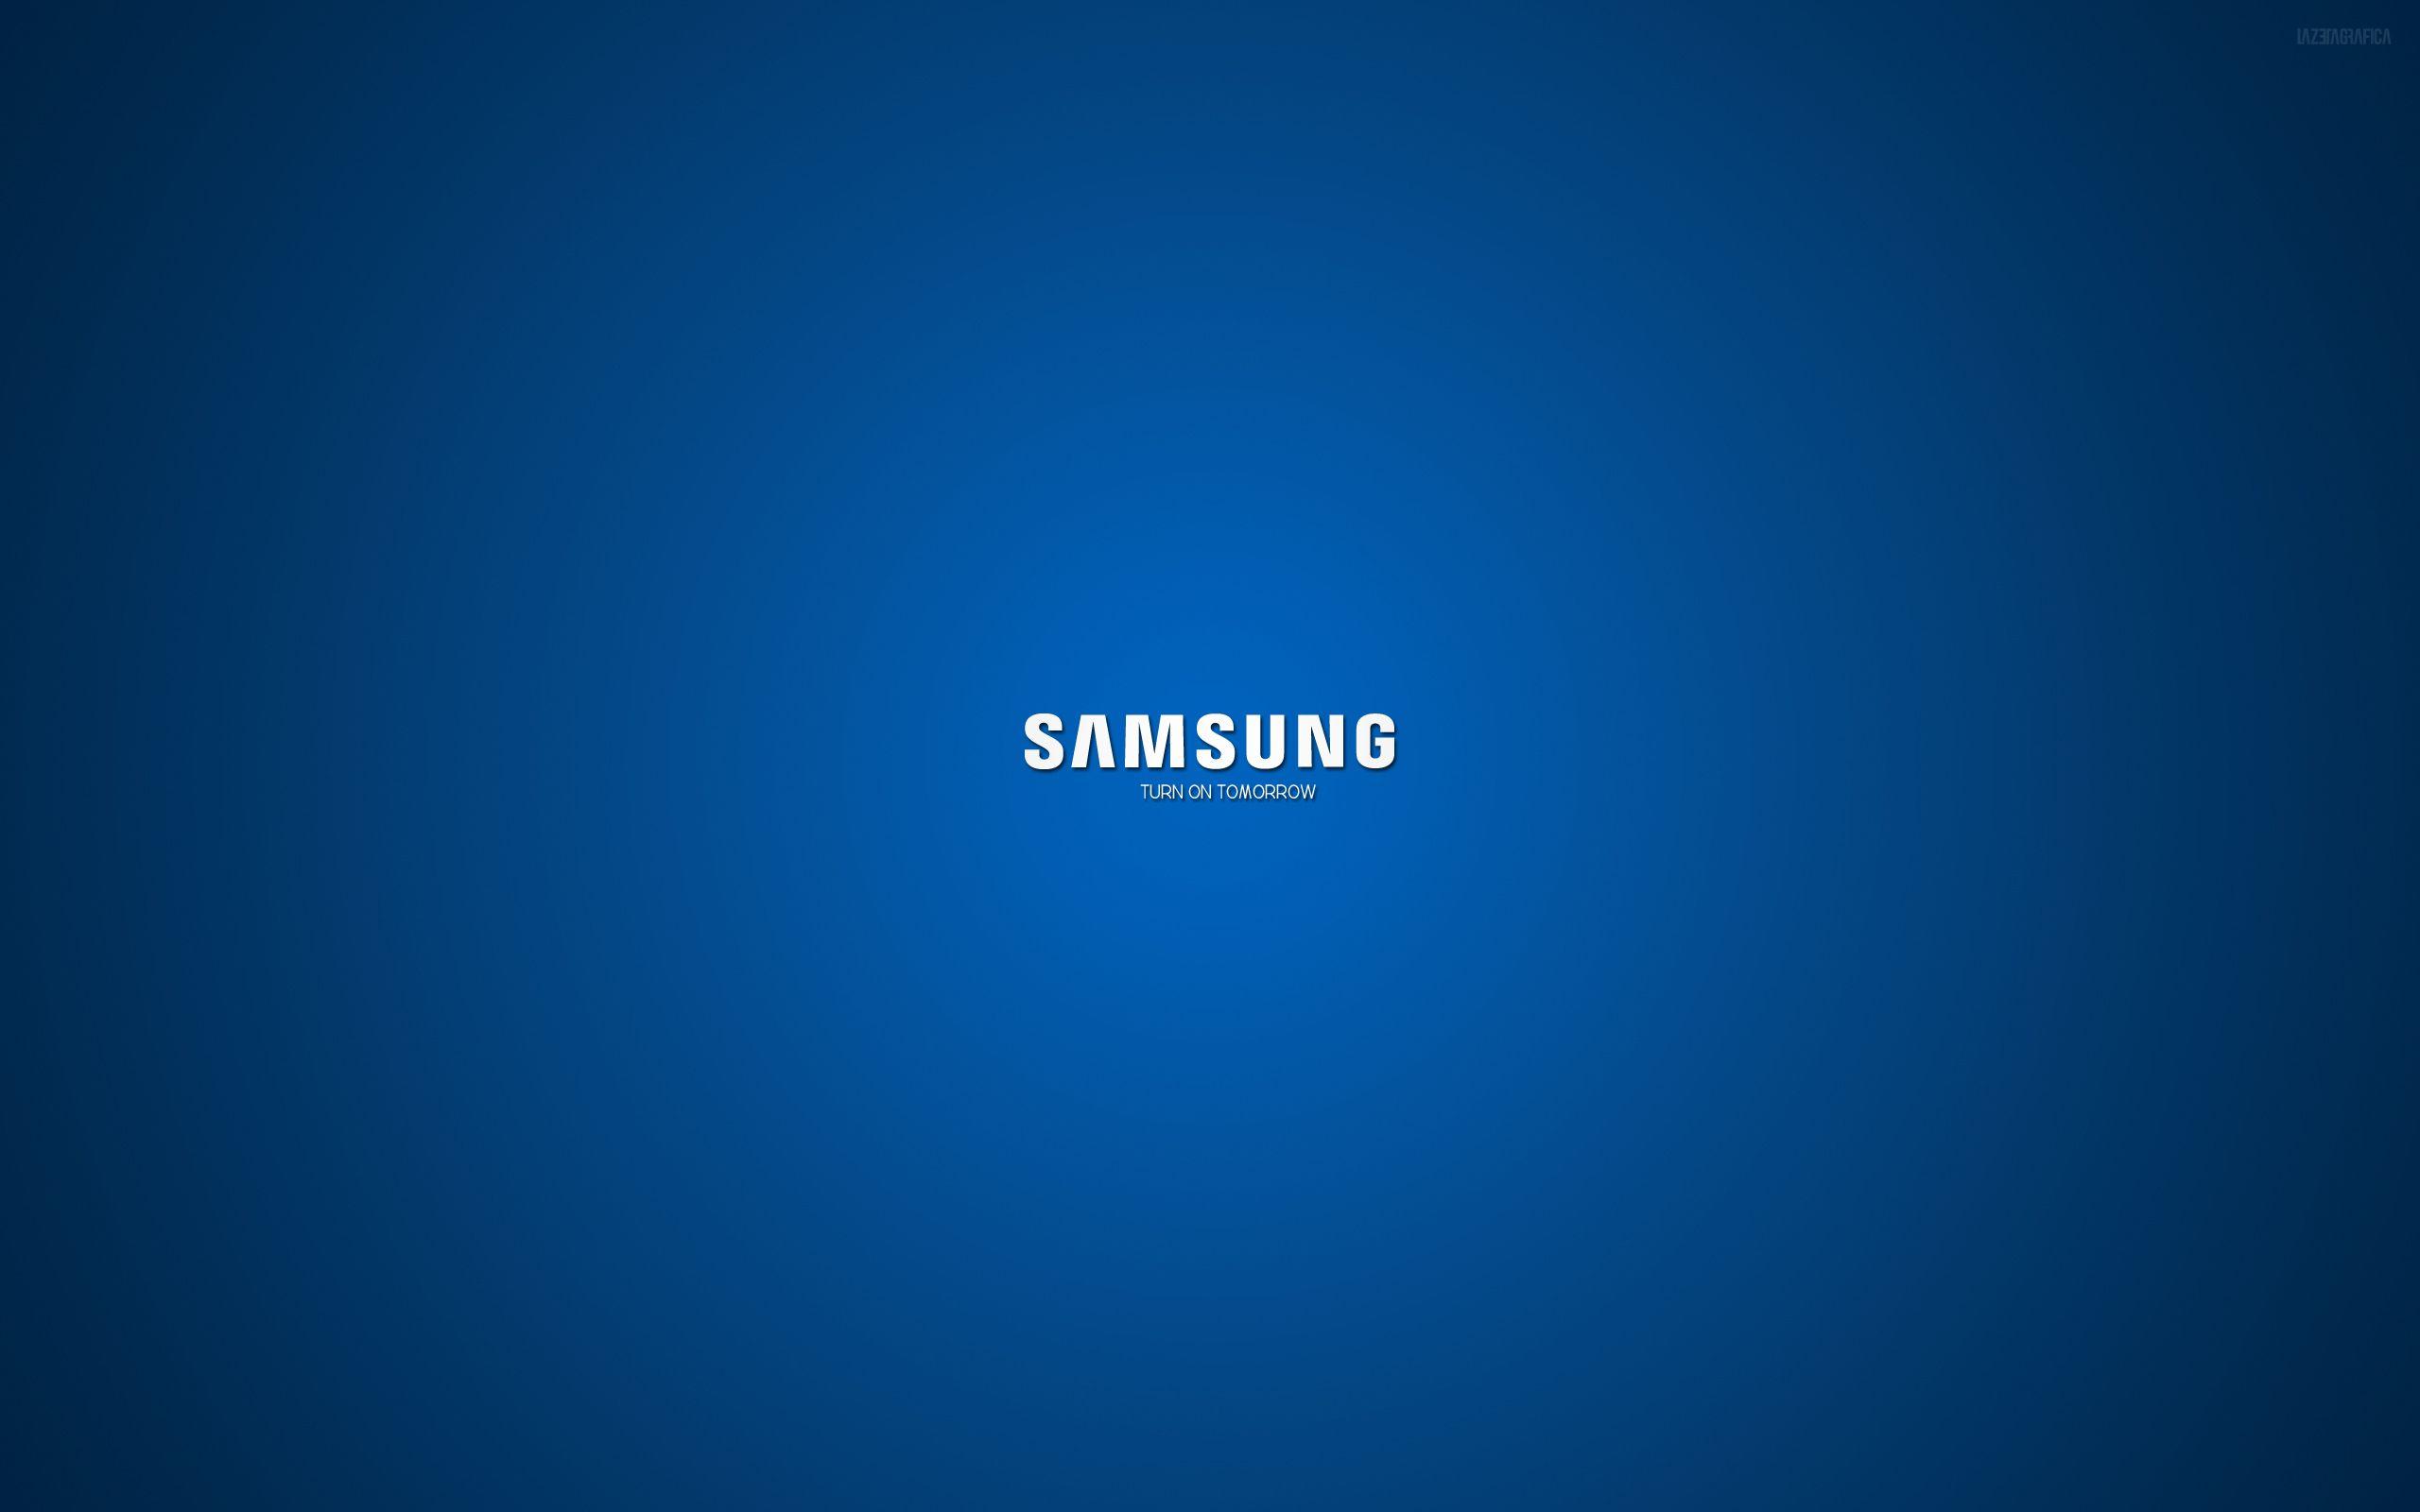 Samsung Logo 2560 1600 Samsung Logo Samsung Laptop Samsung Galaxy Wallpaper